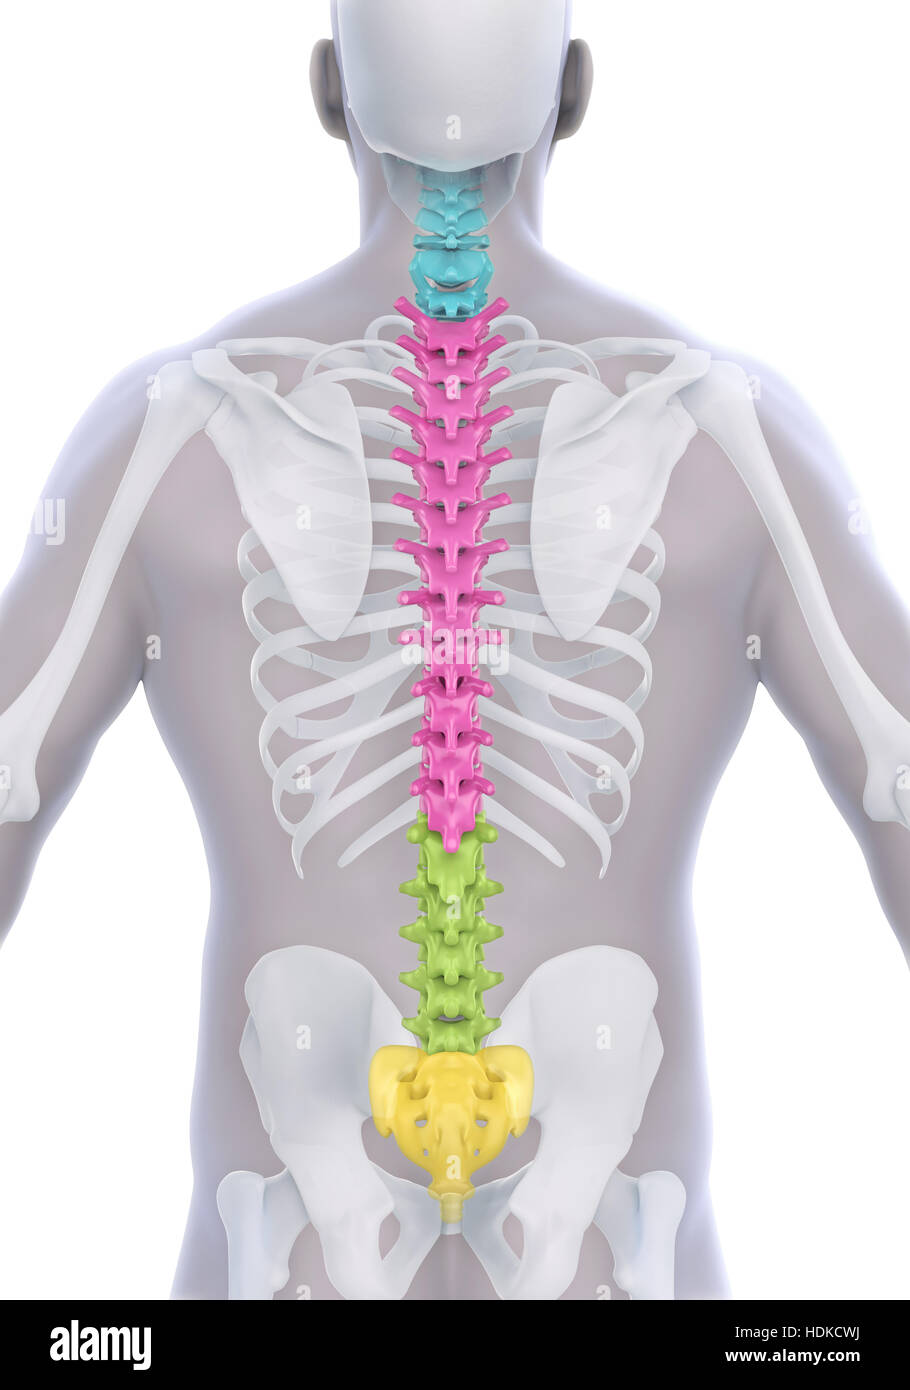 Cervical Spinal Cord Stock Photos Cervical Spinal Cord Stock